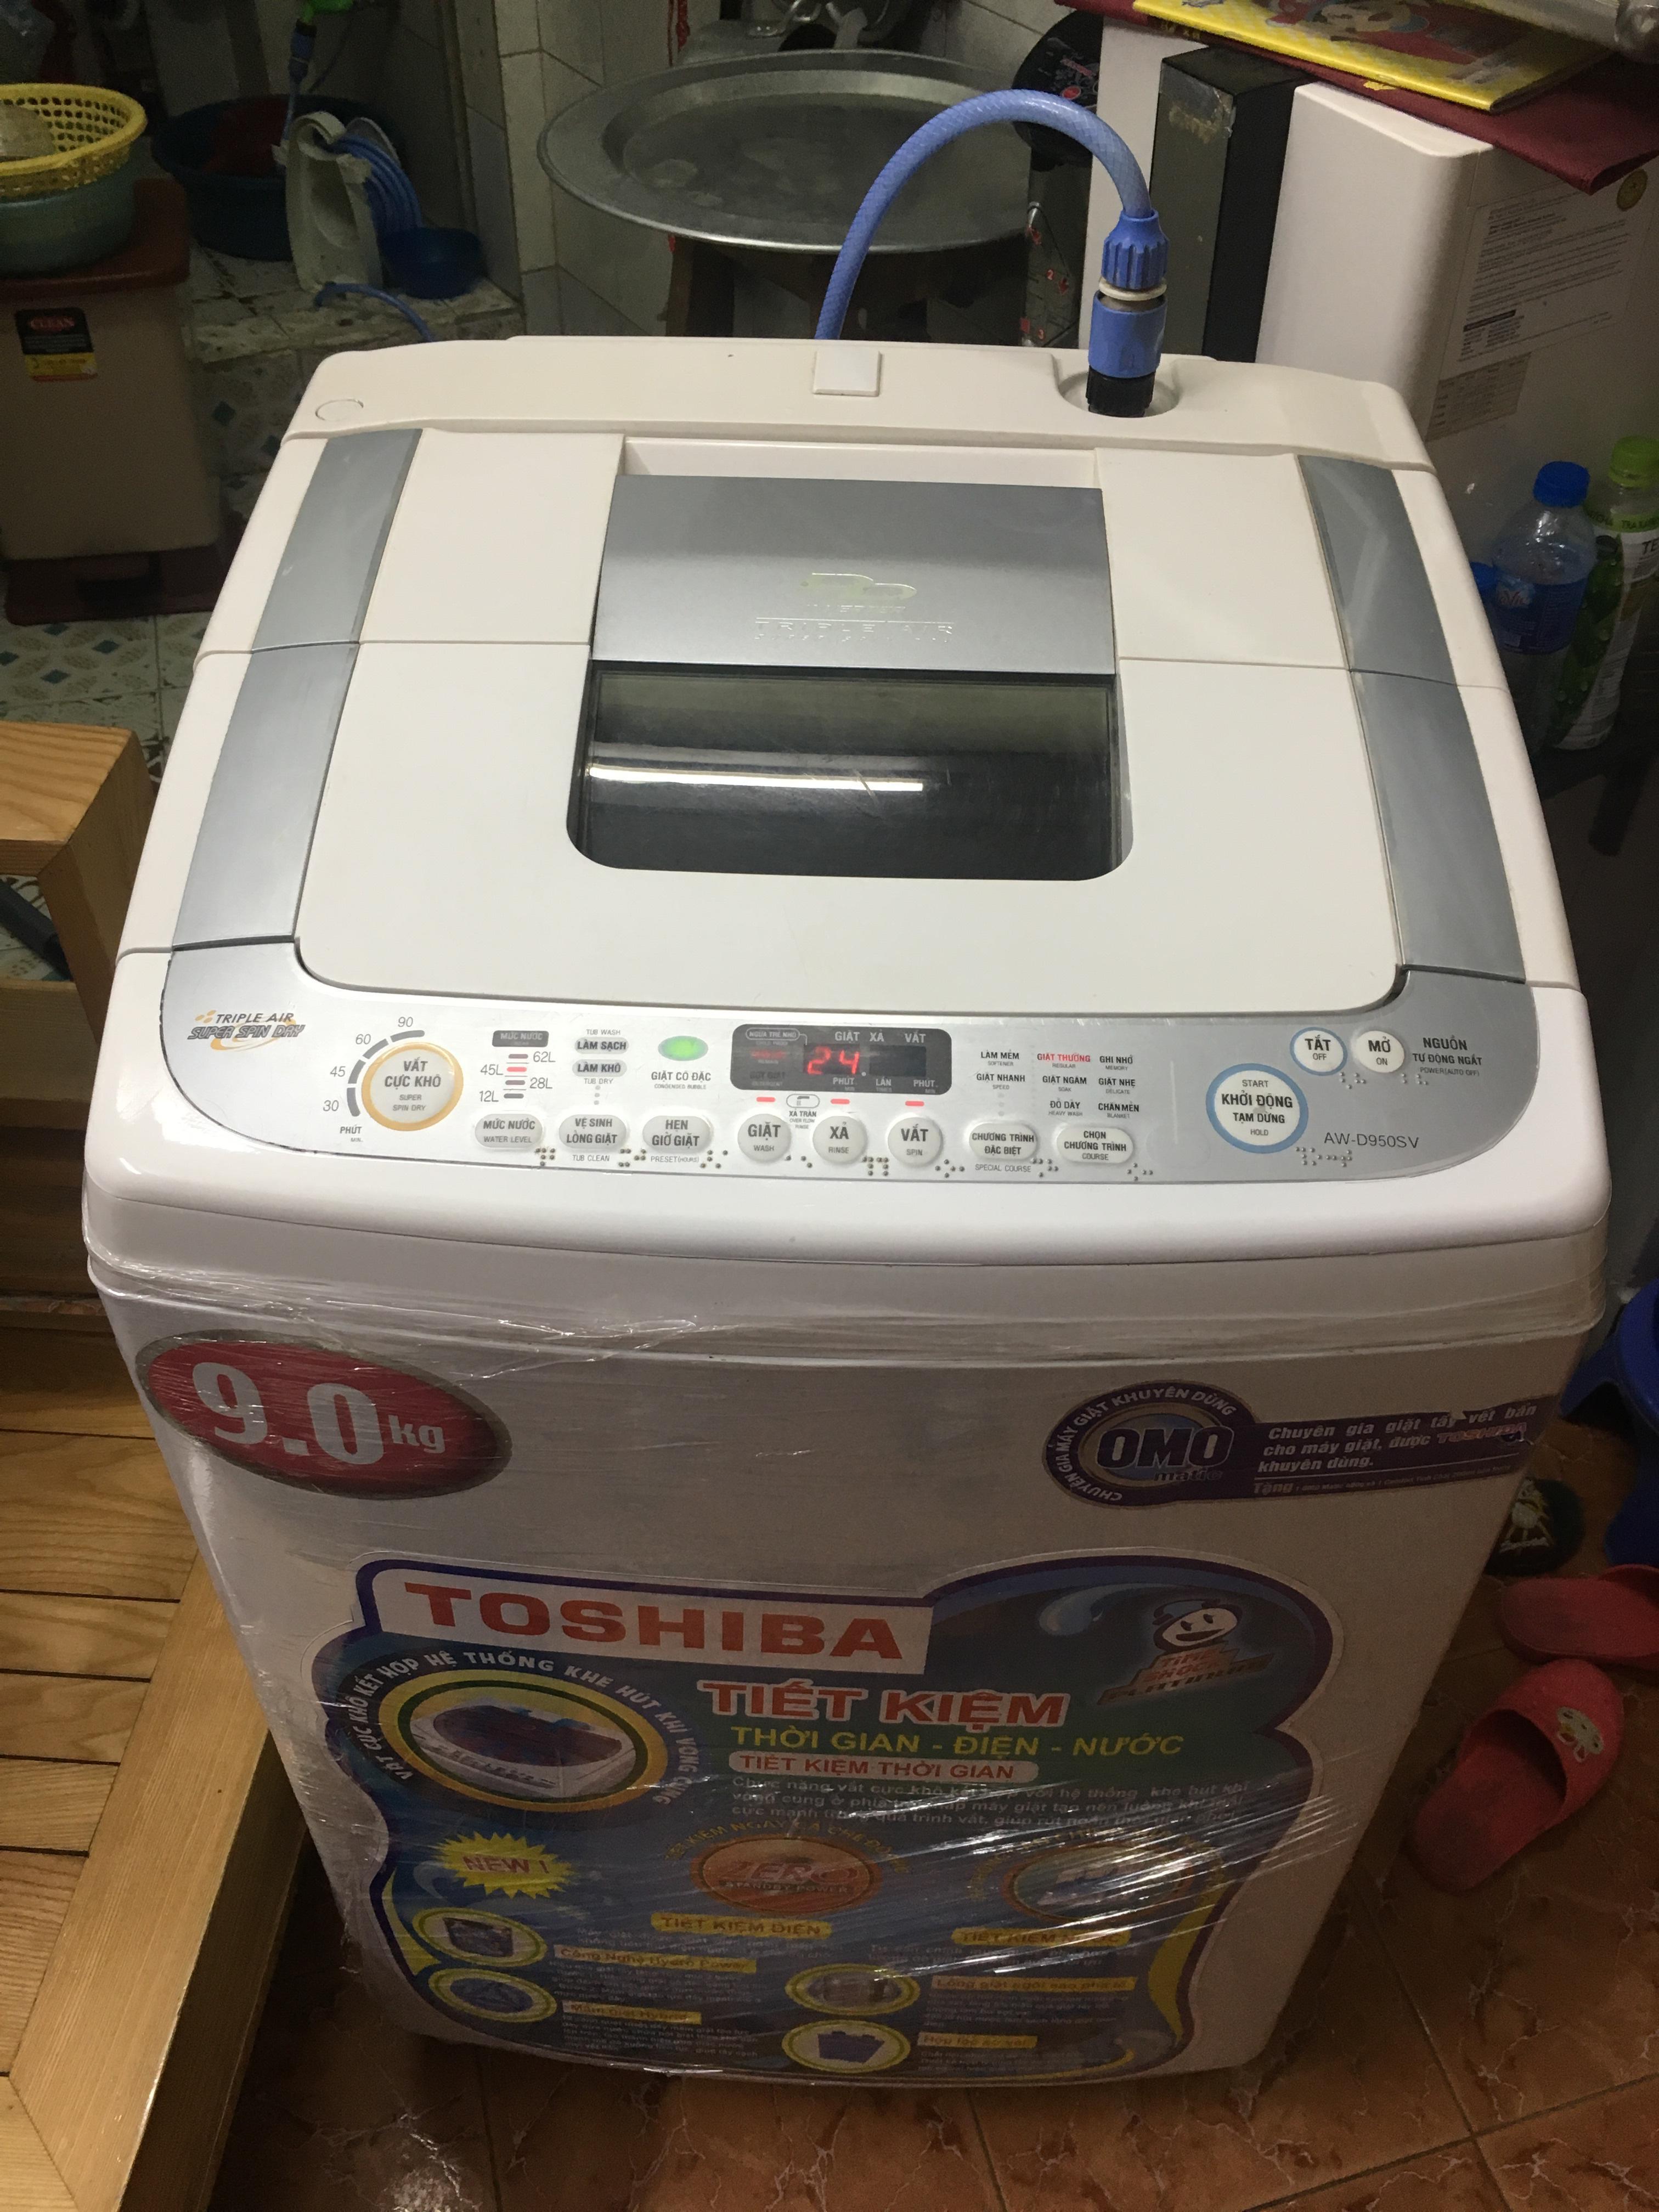 Máy giặt toshiba 9kg inveter đời cao mới 85%